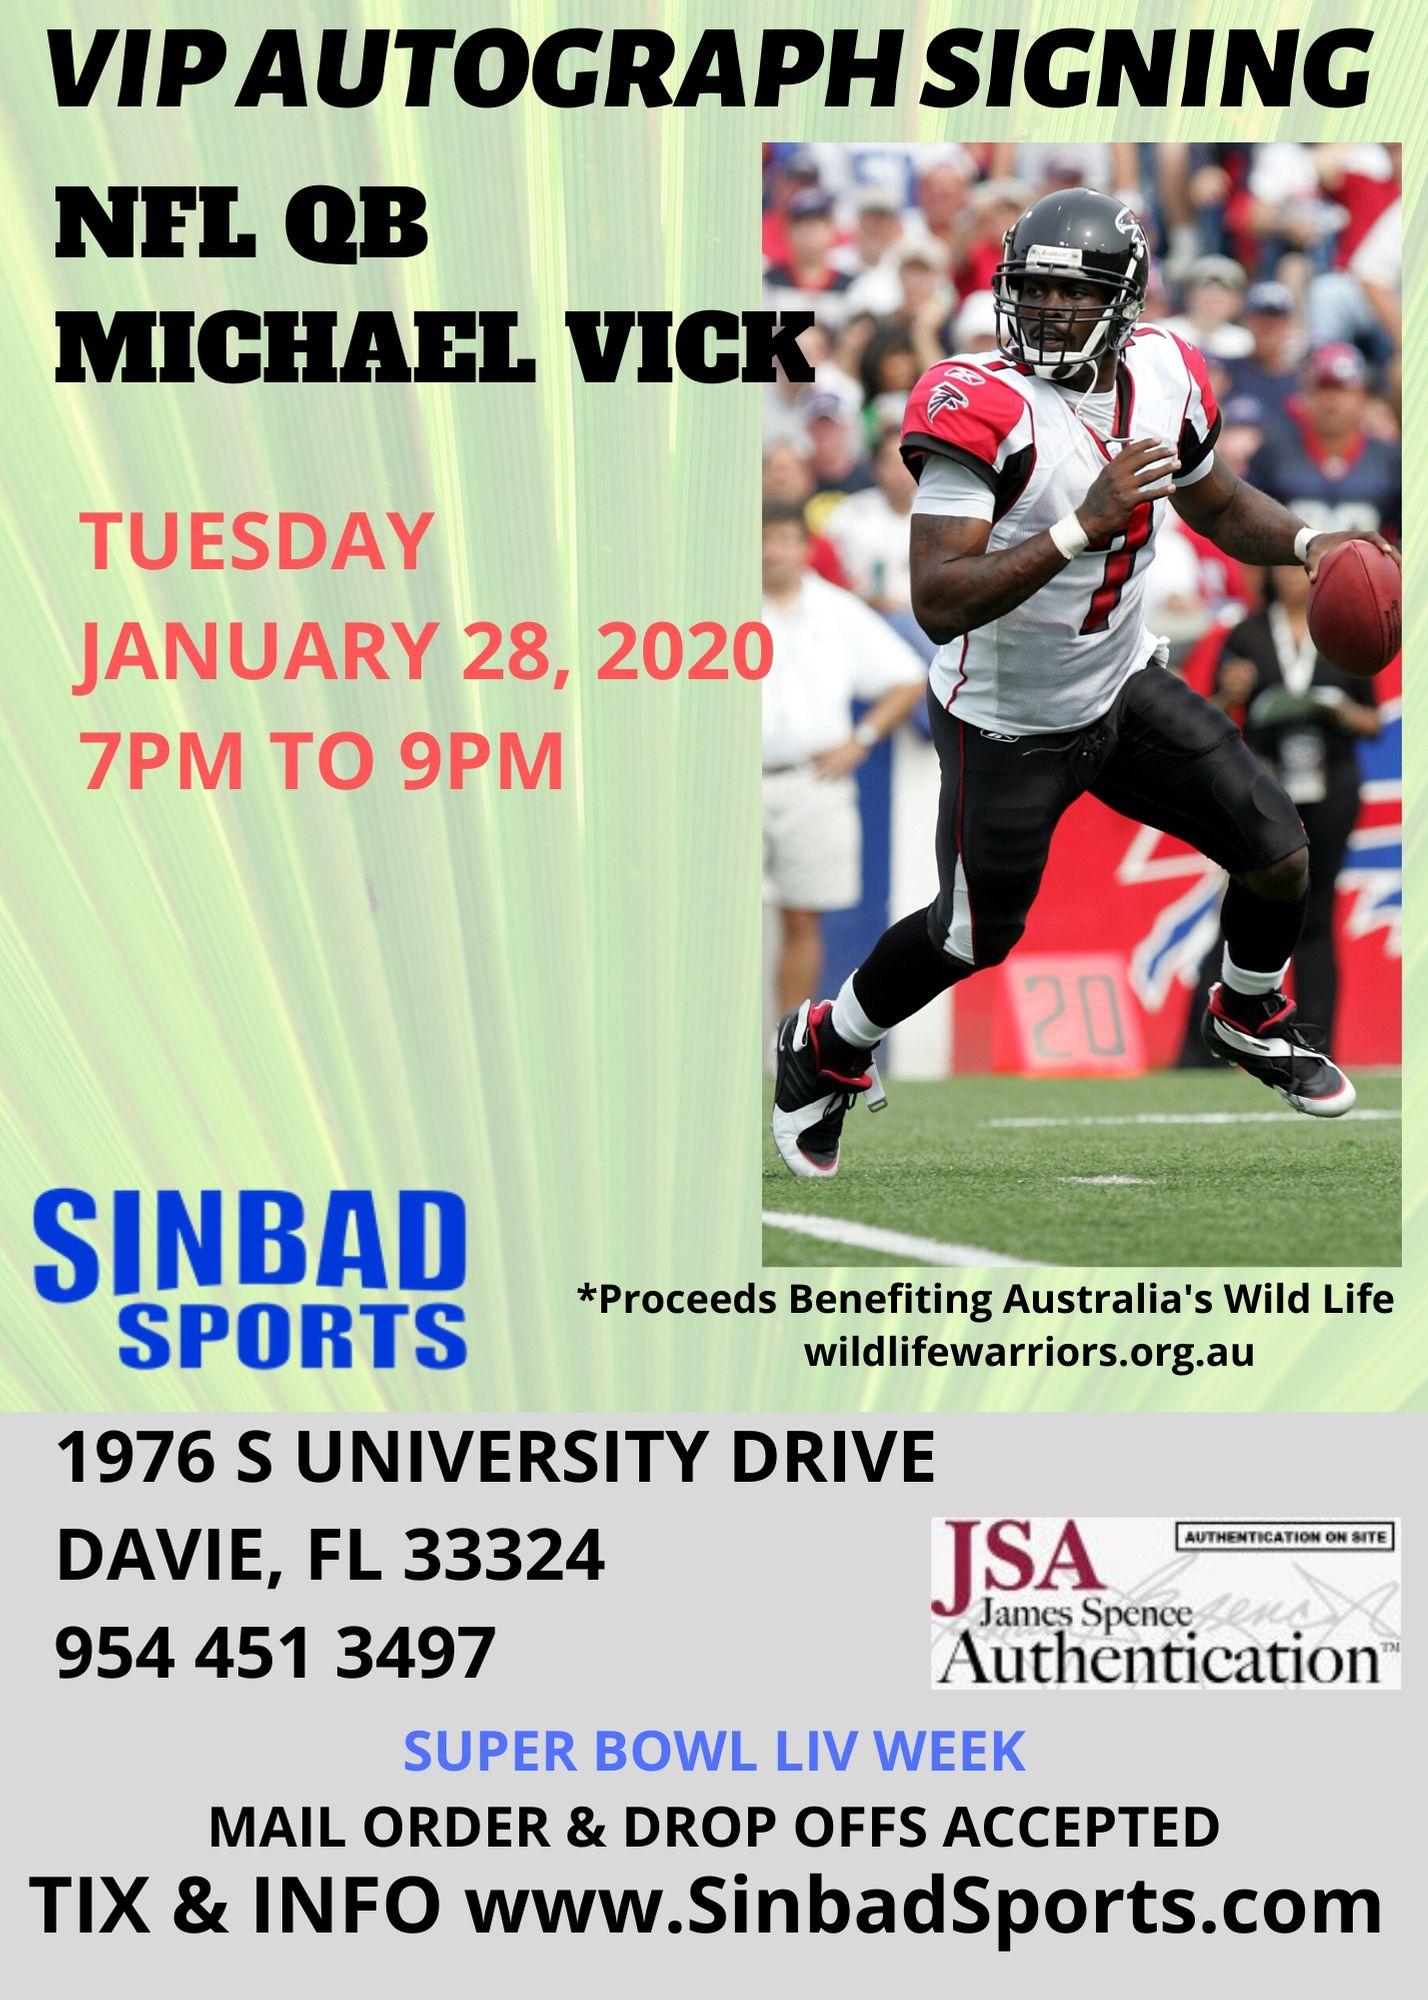 michael-vick-flyer-signing.jpg